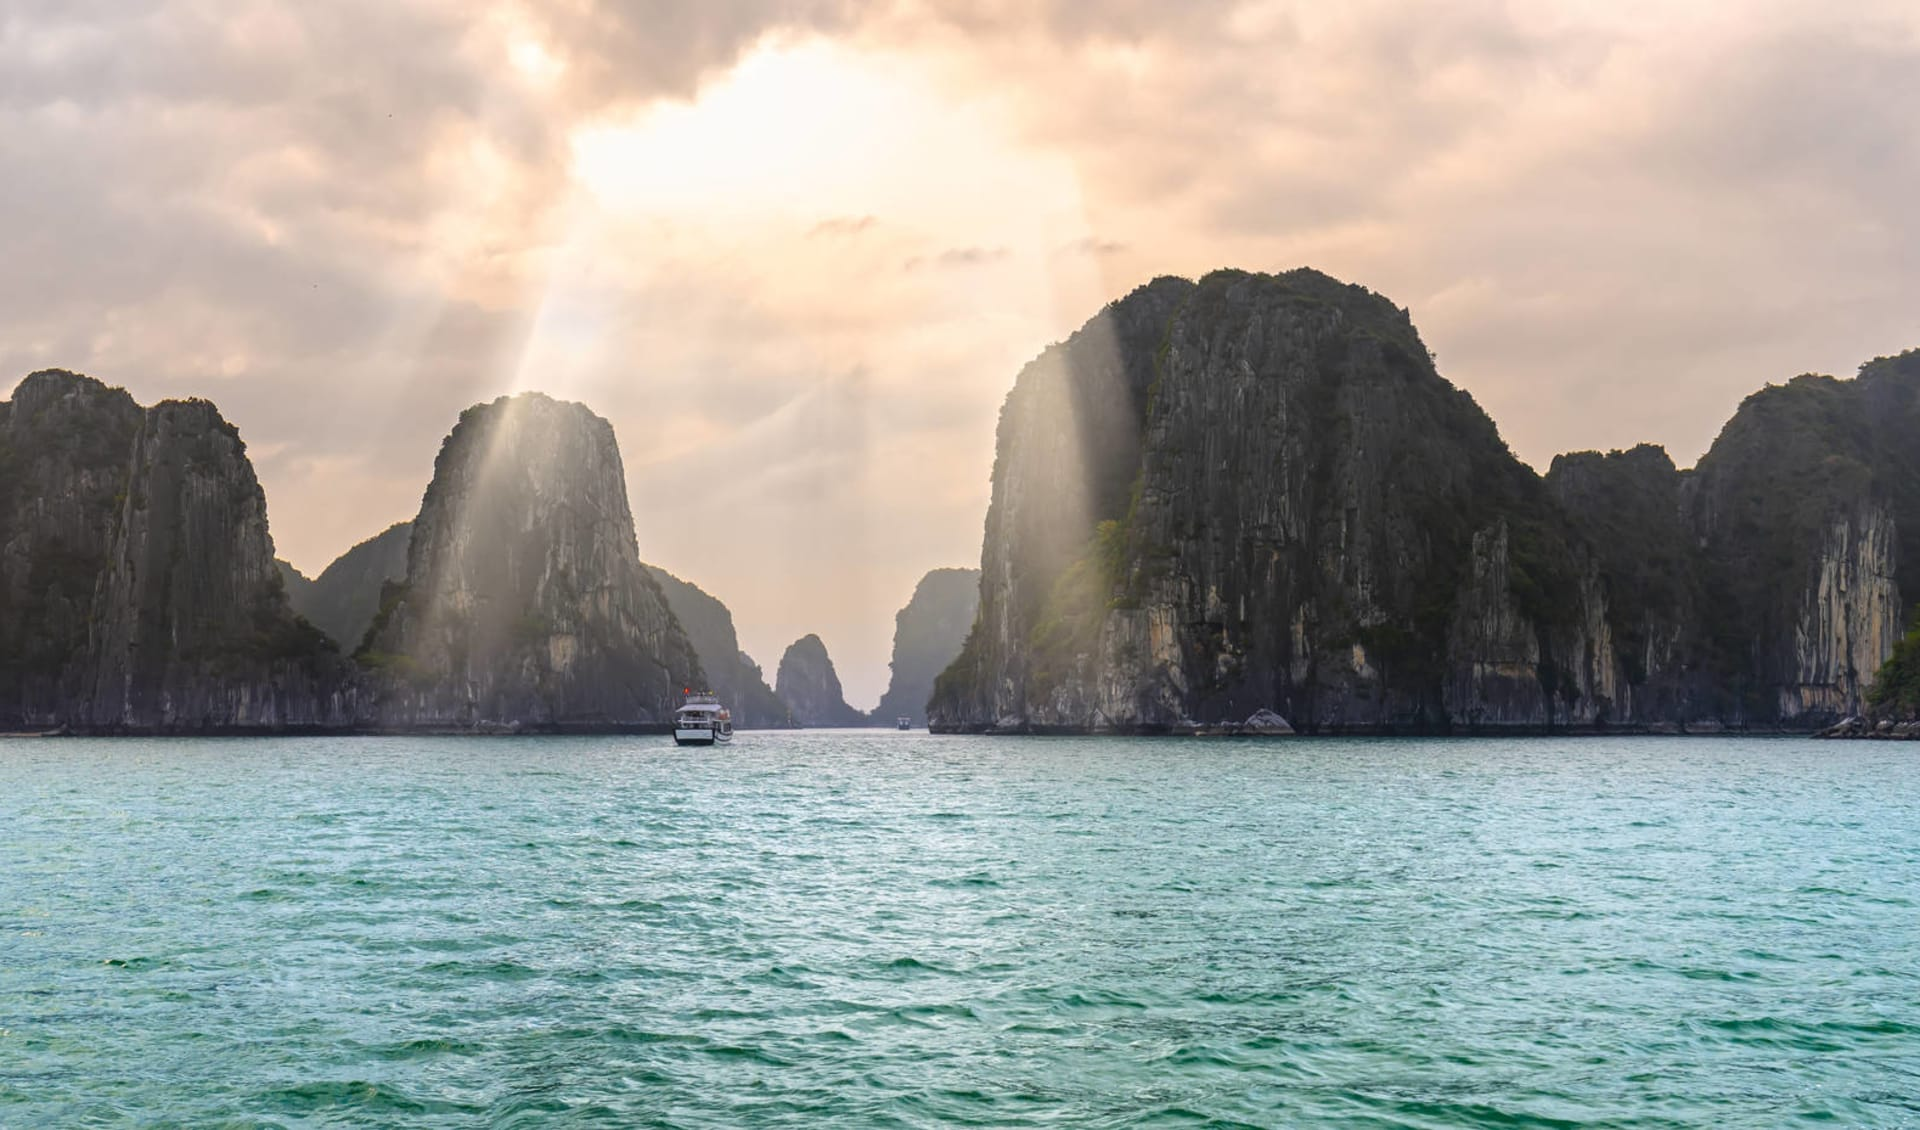 Halong Bucht Kreuzfahrten mit «The Au Co» ab Hanoi: Halong Bay